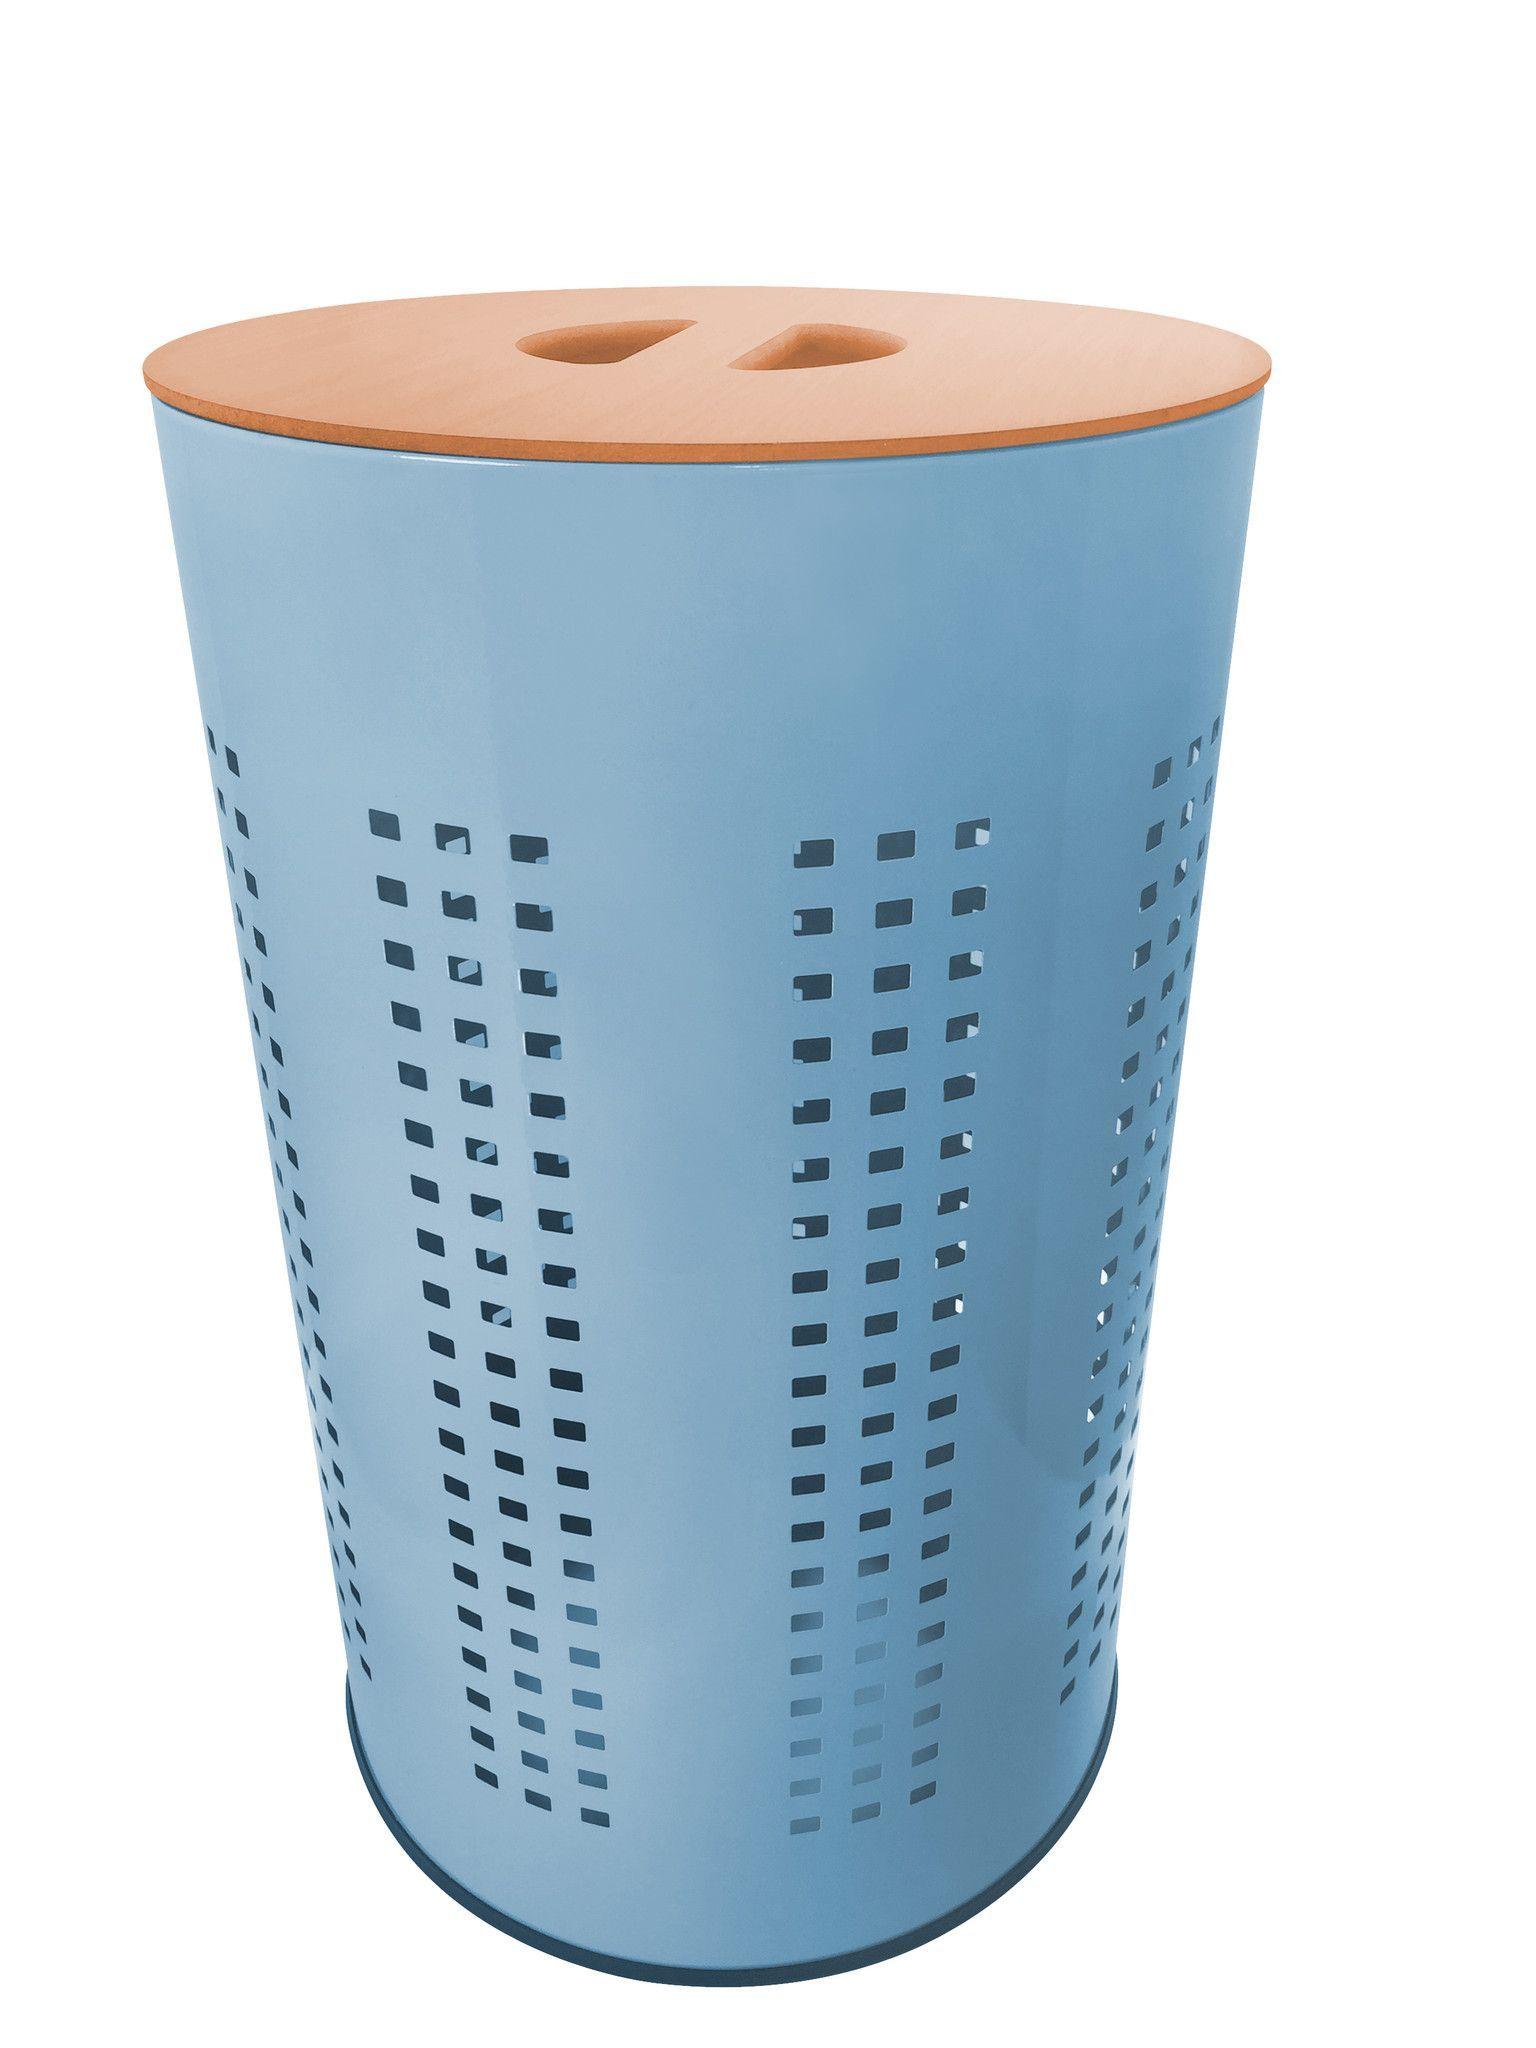 Light Blue Stainless Steel Laundry Bin Hamper 50l Ventilated